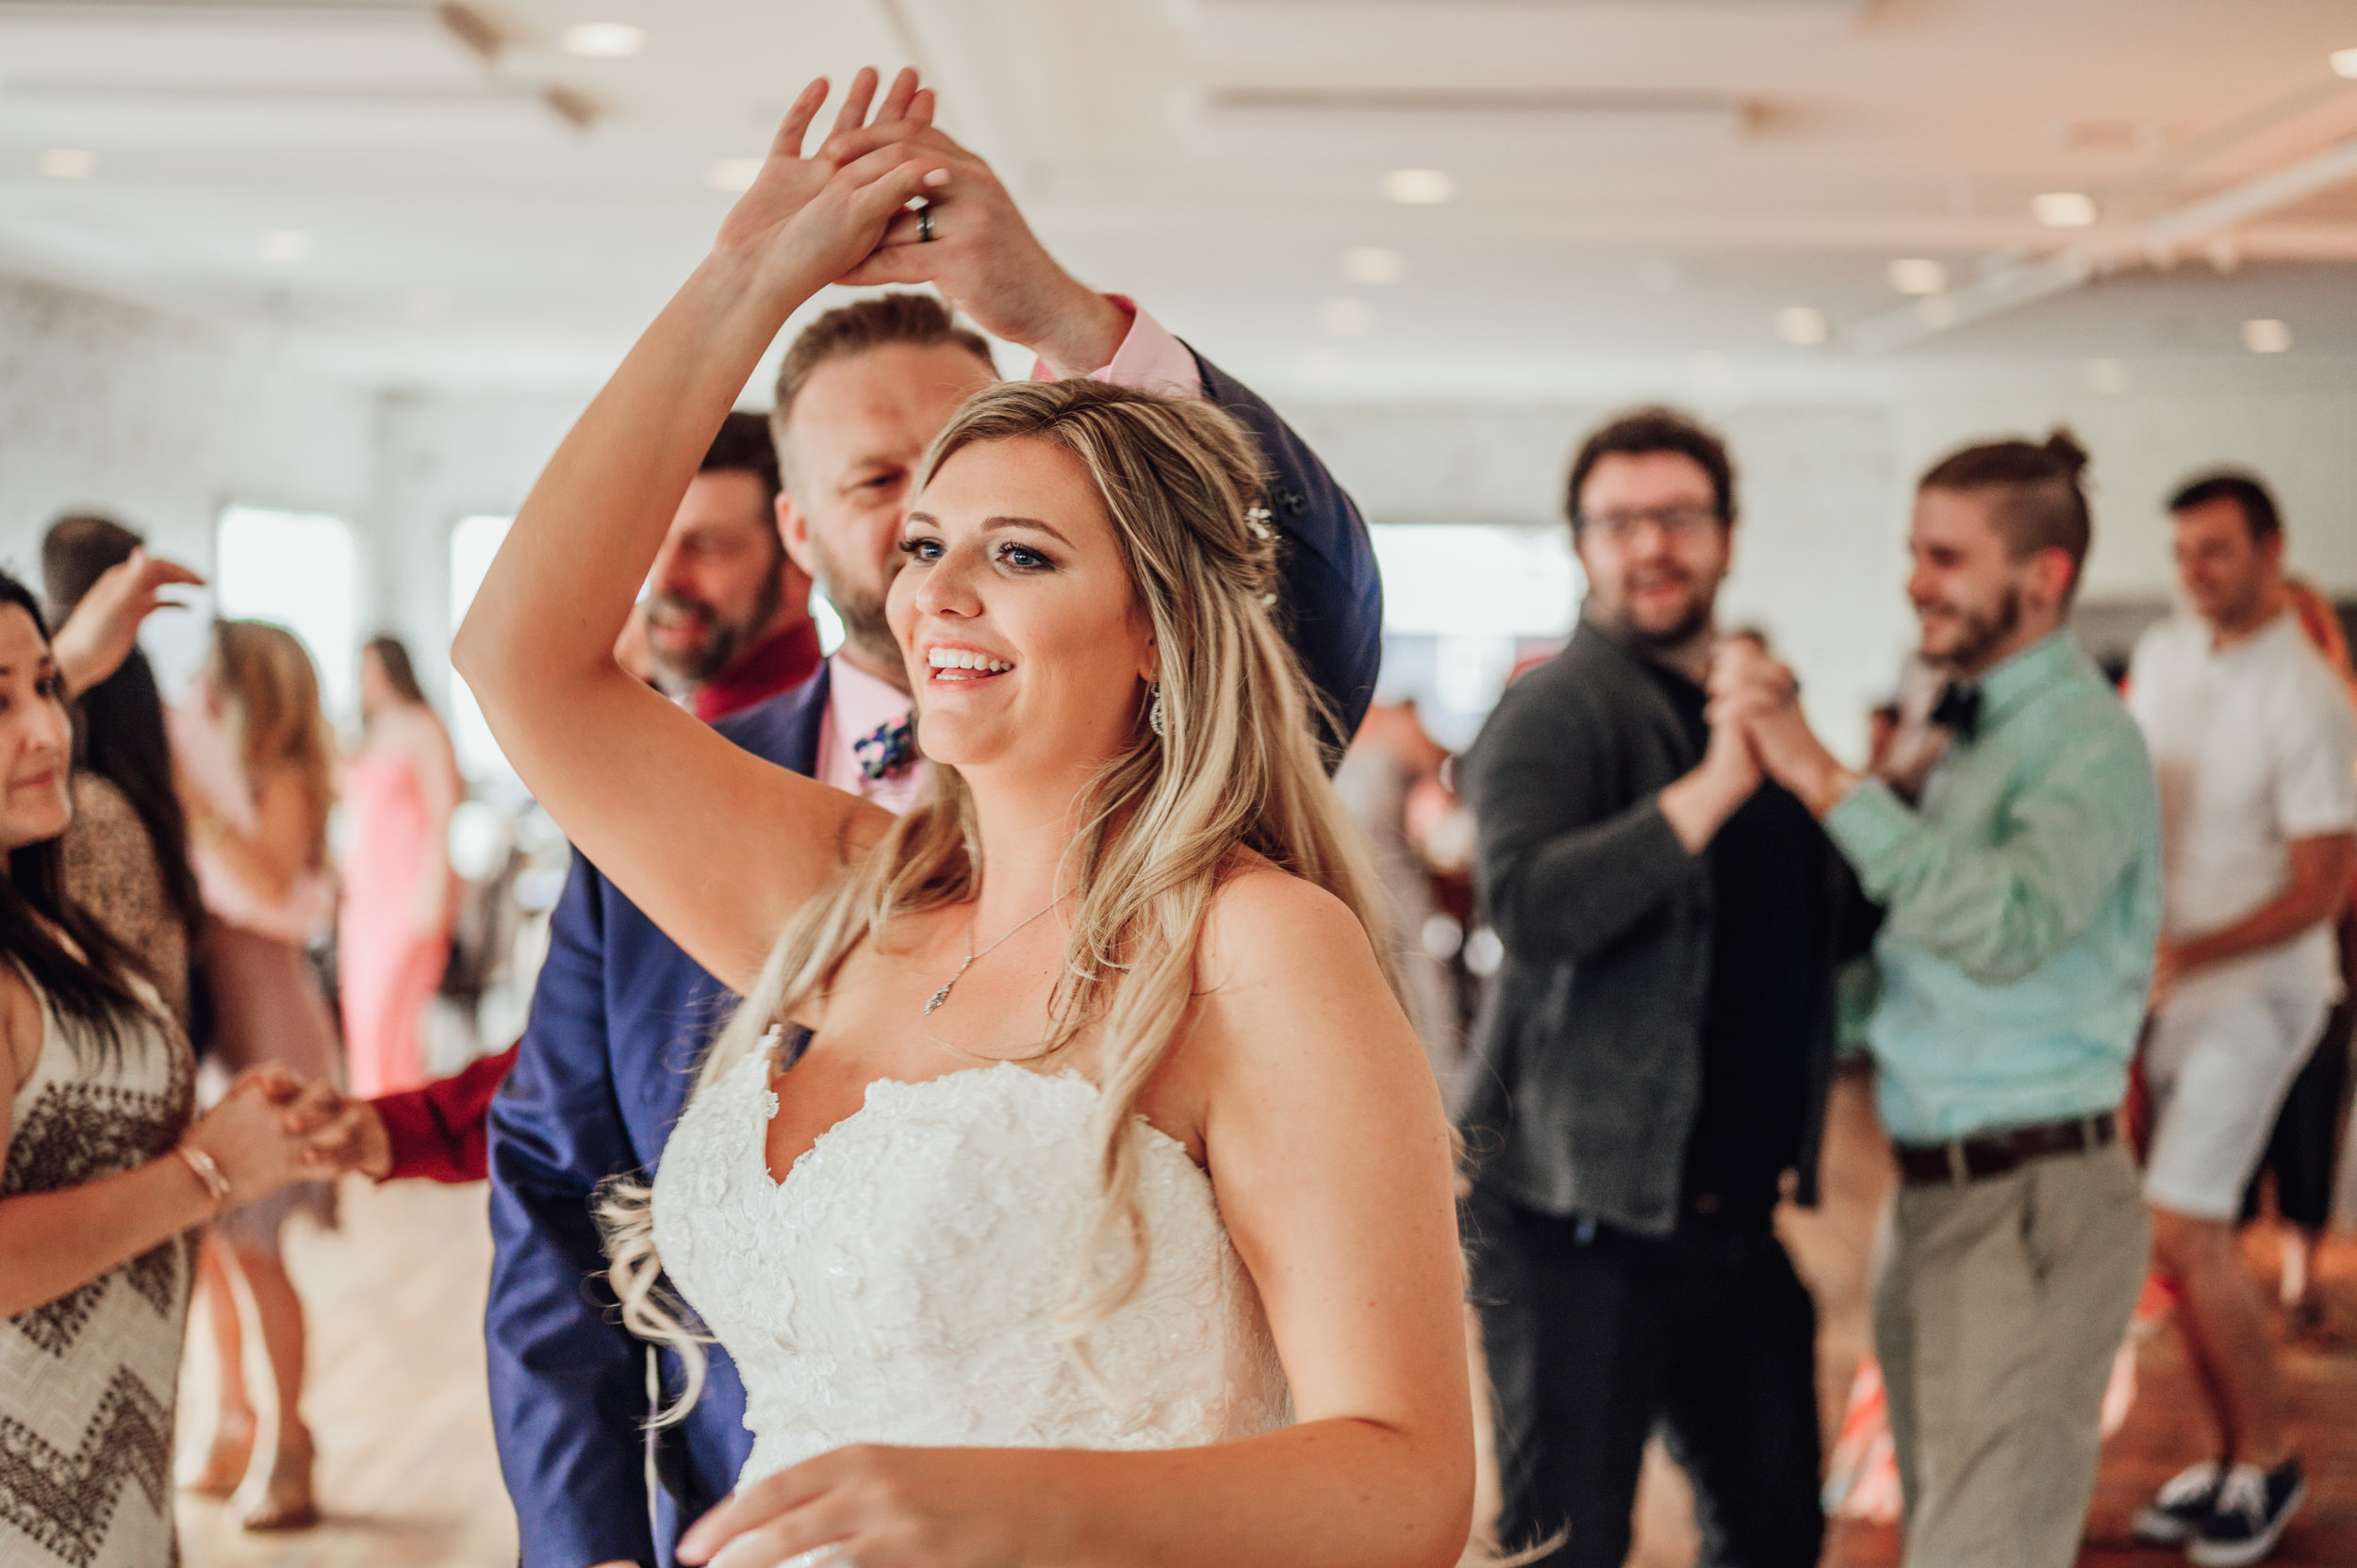 New Jersey Wedding Photographer, Felsberg Photography LBI wedding photography 109.jpg